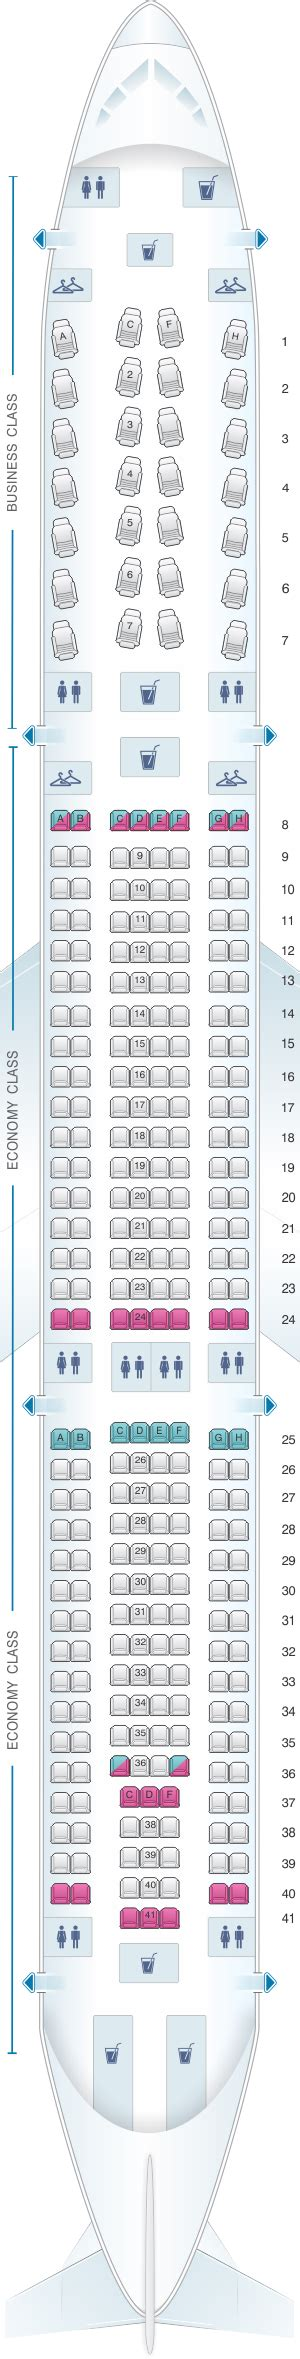 seat map american airlines airbus   seatmaestro